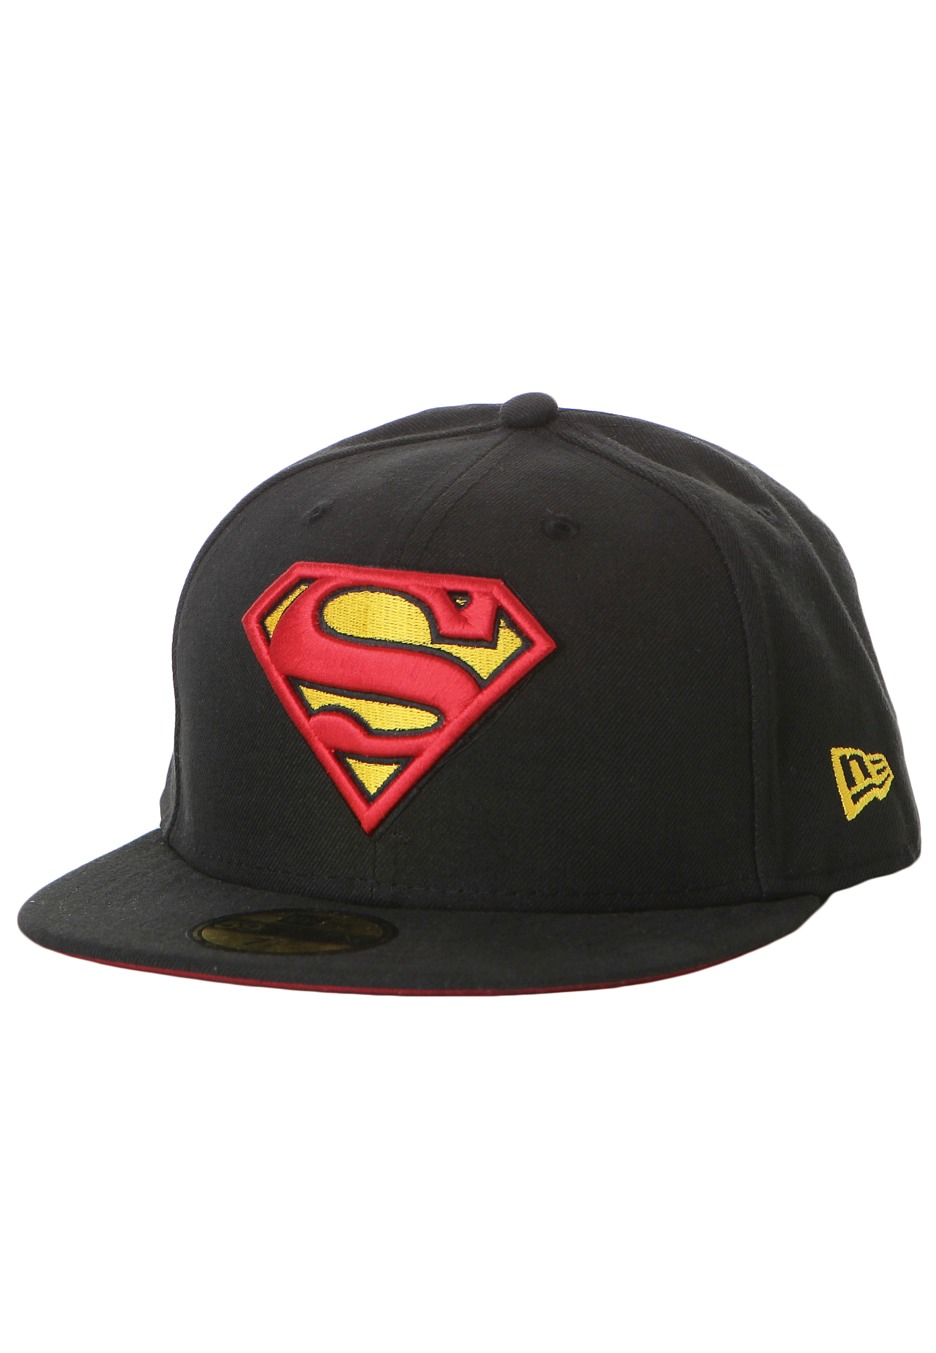 New Era - Basic Badge Superman - Cap - Impericon.com UK 8555be9e596